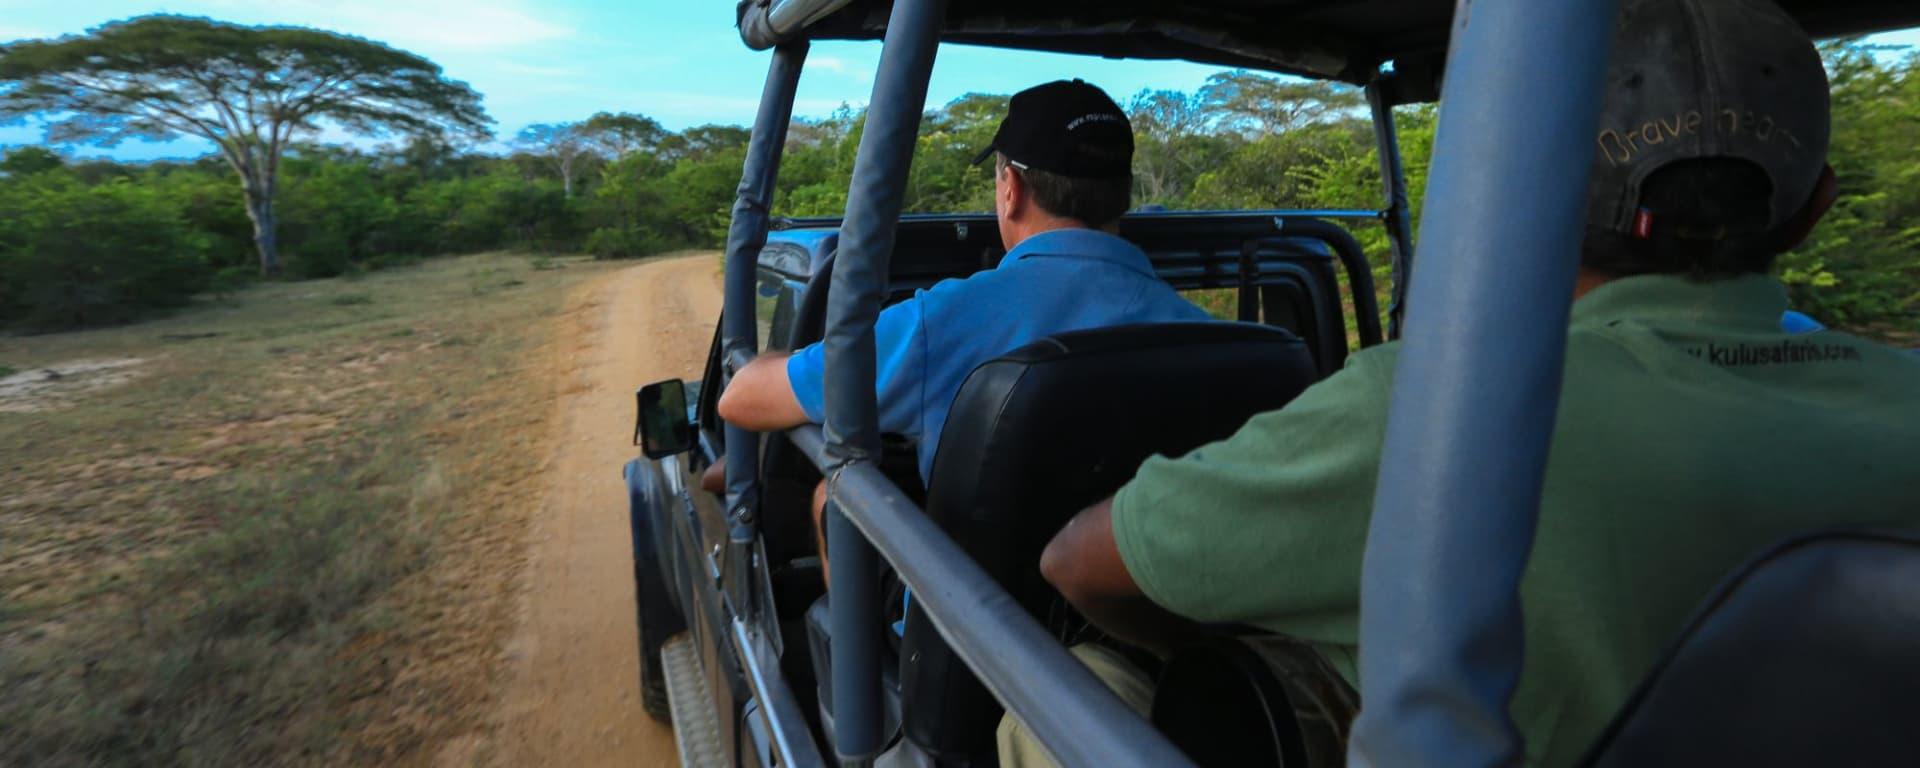 Safari dans le parc national de Yala - Kulu Safaris - 2 jours de Colombo: Kulu Safaris Yala